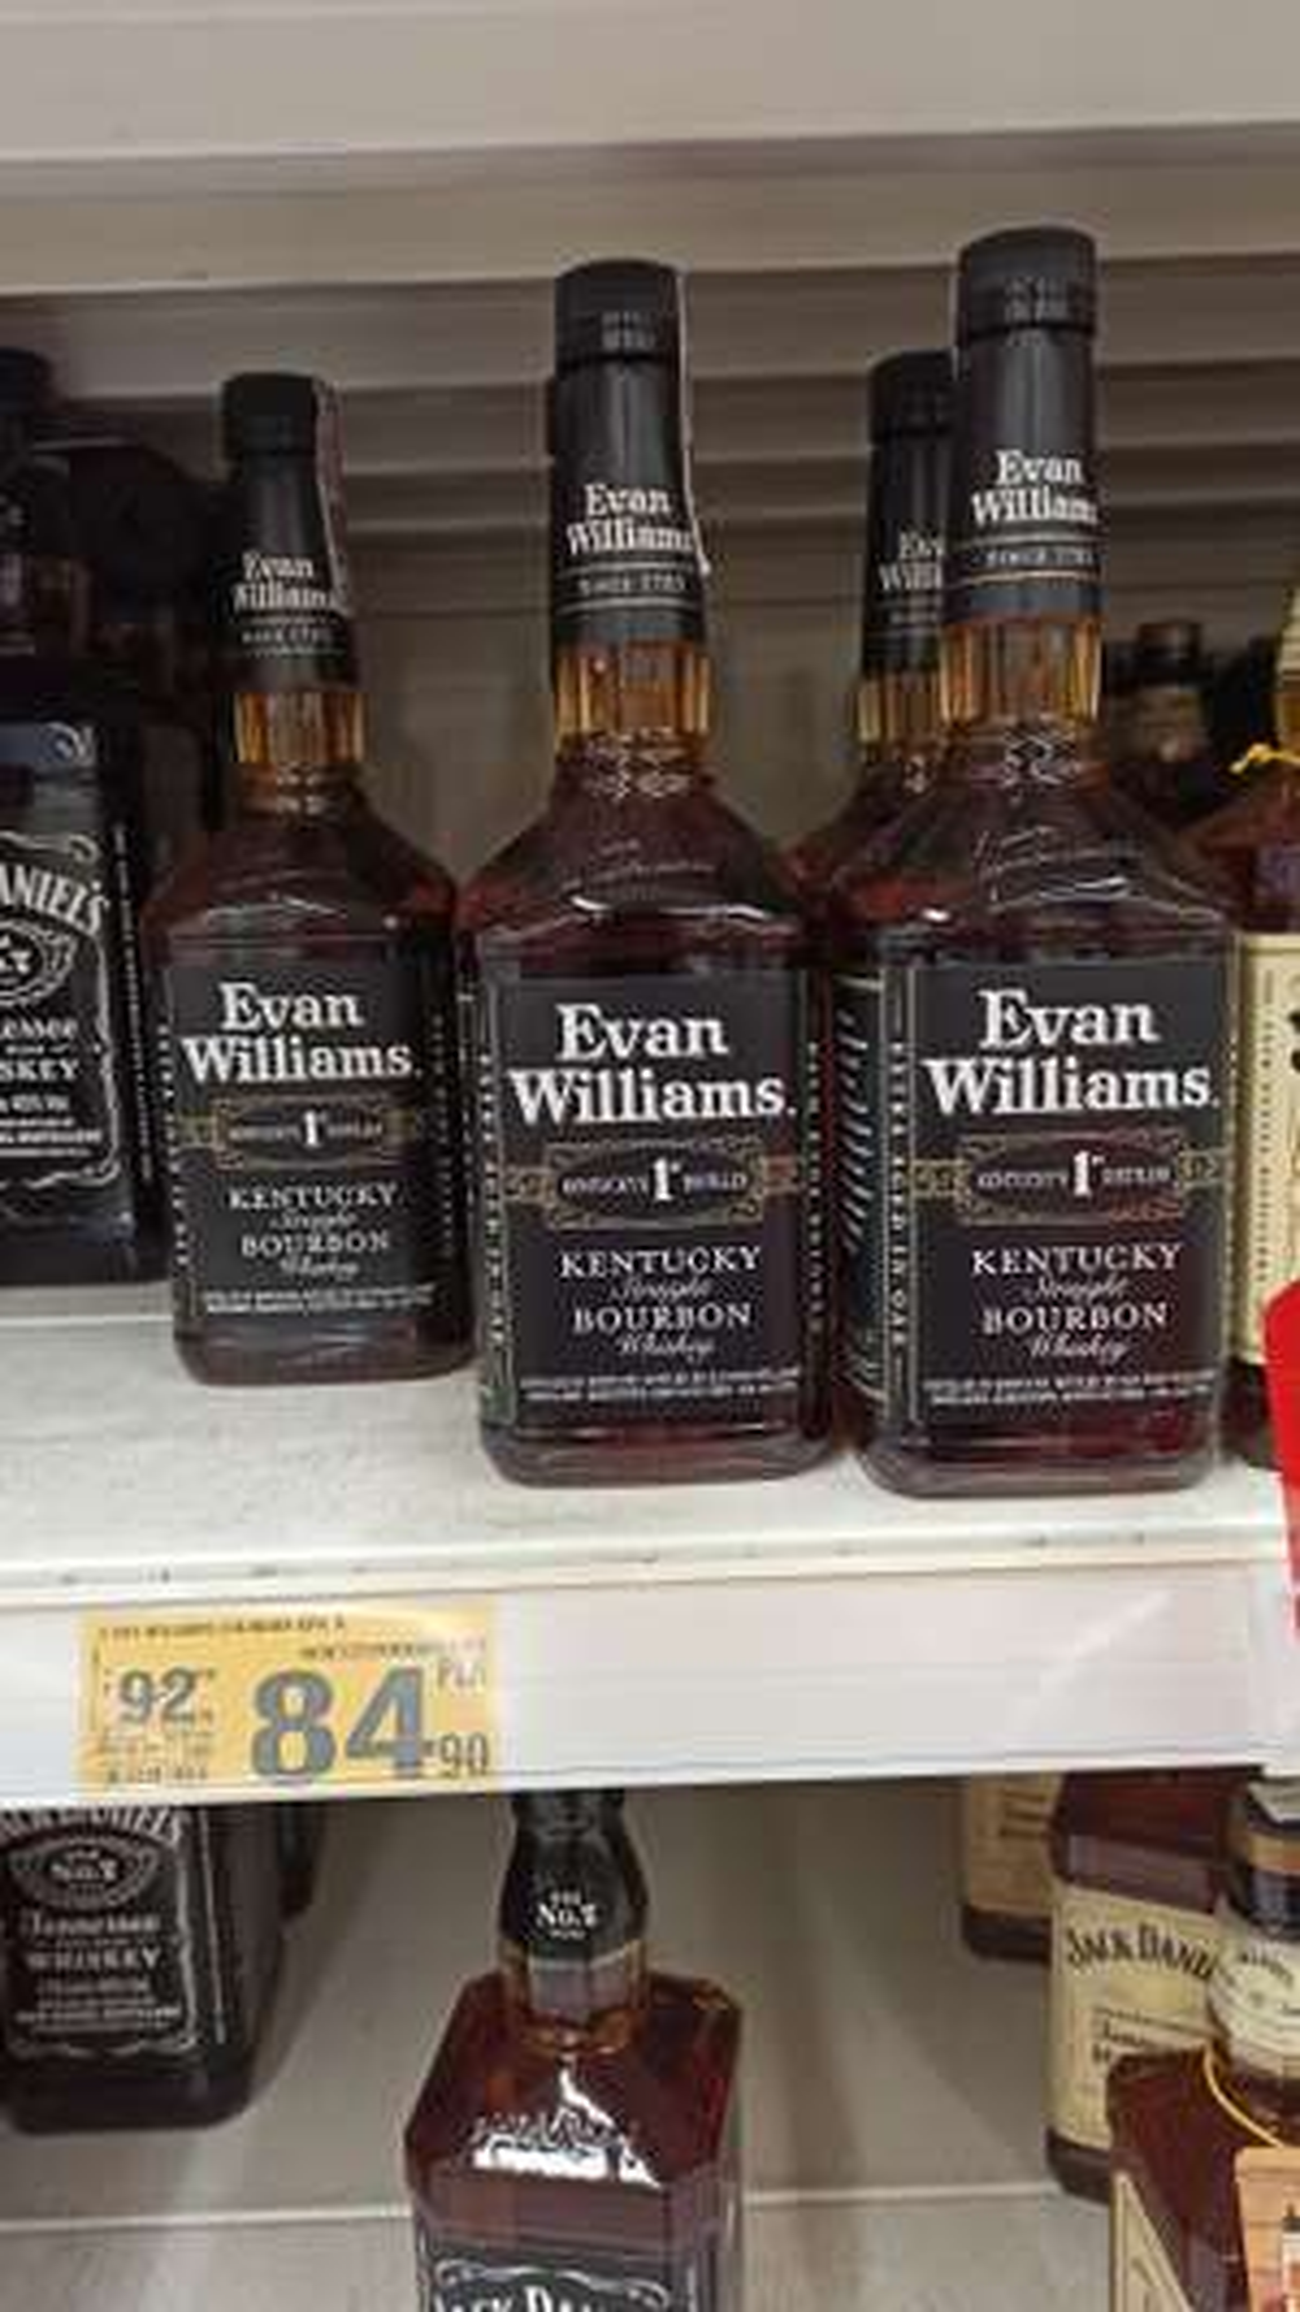 Burbon Whisky Evan Williams 1l, Dewar's 12 yo 0,7l, Tequila Mezcal Beneva 0,7l #Auchan